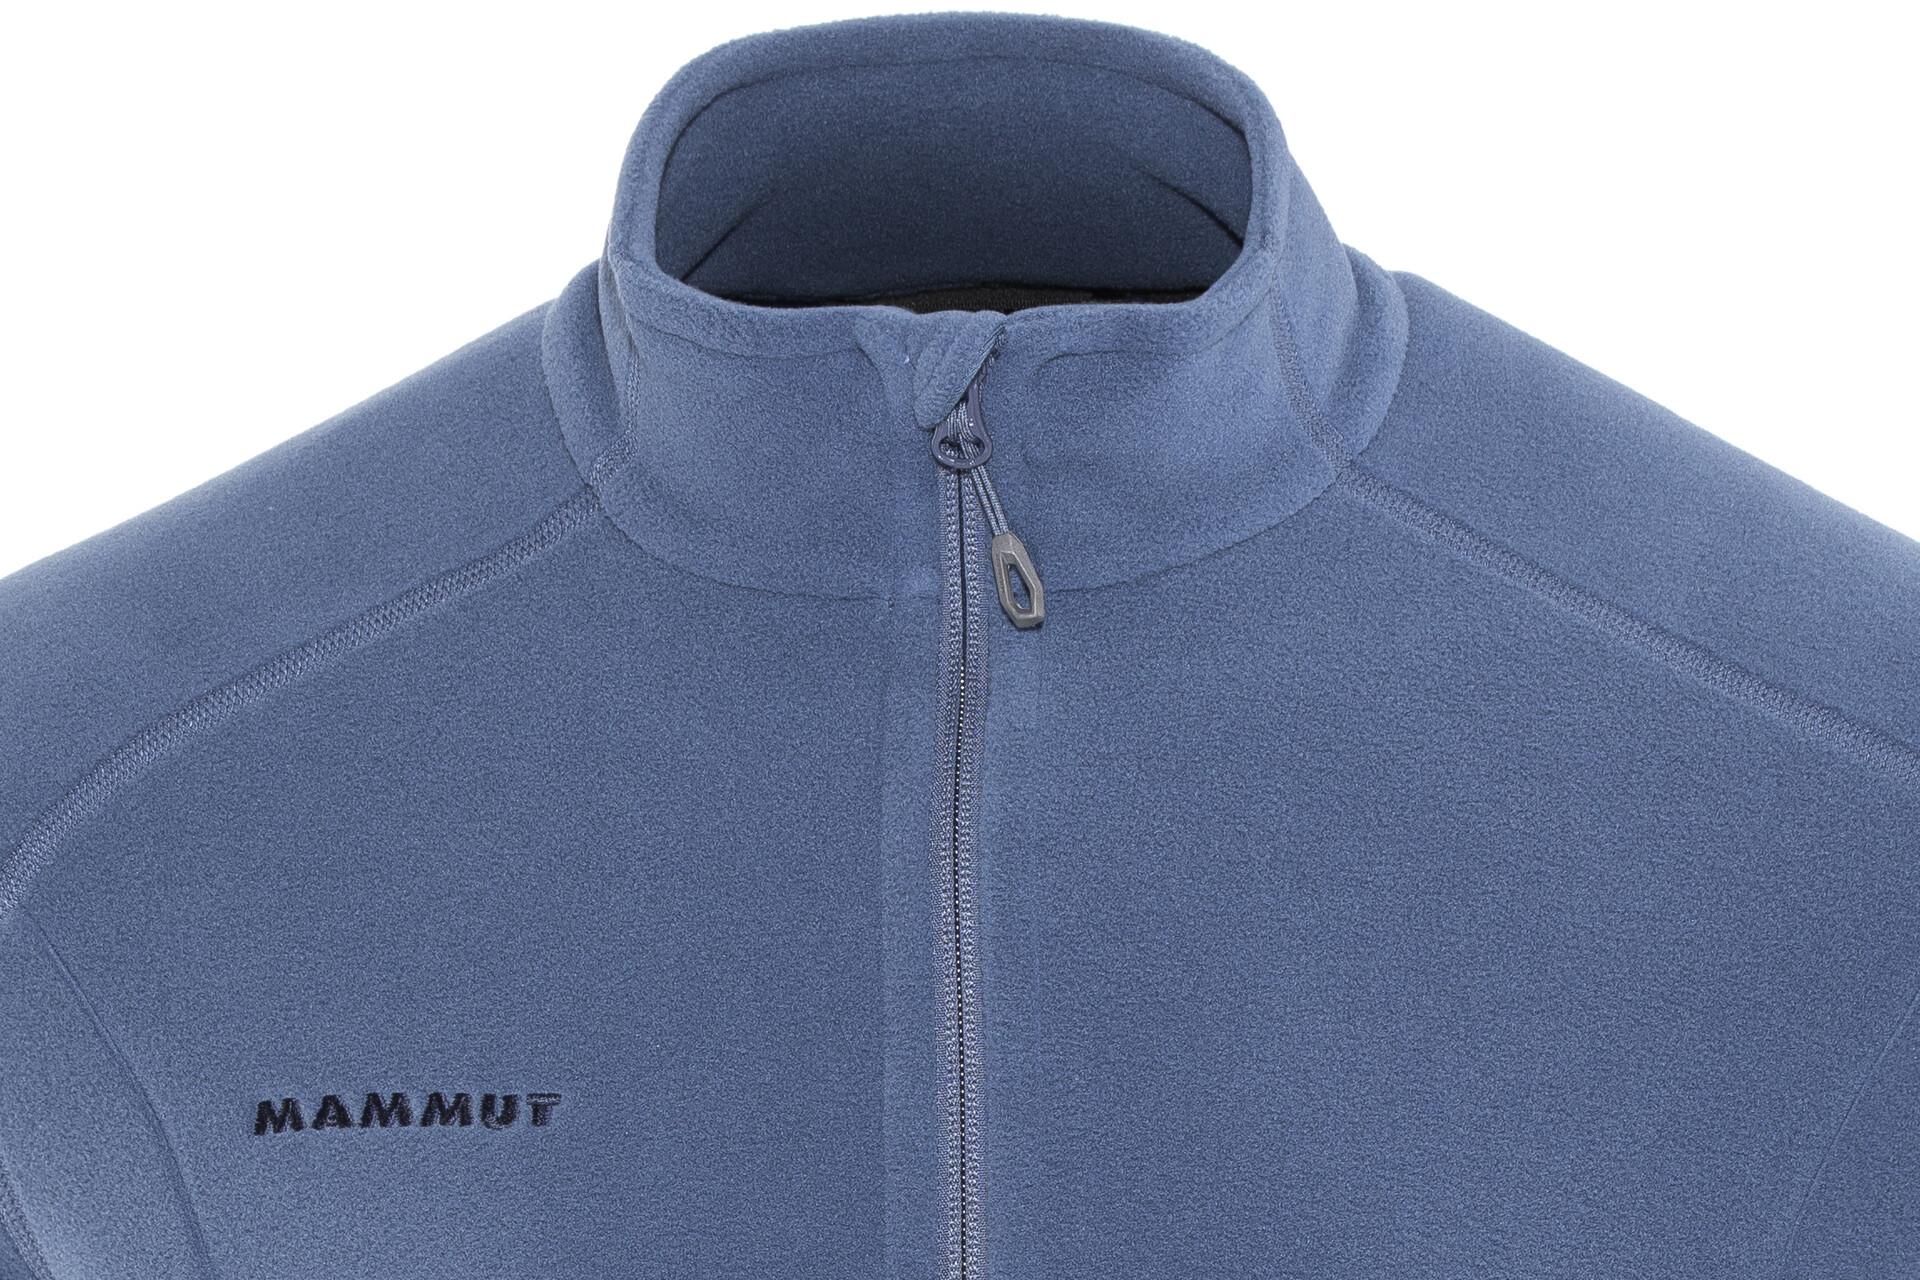 Mammut Klettergurt Jay : Mammut yadkin ml jacket men jay campz